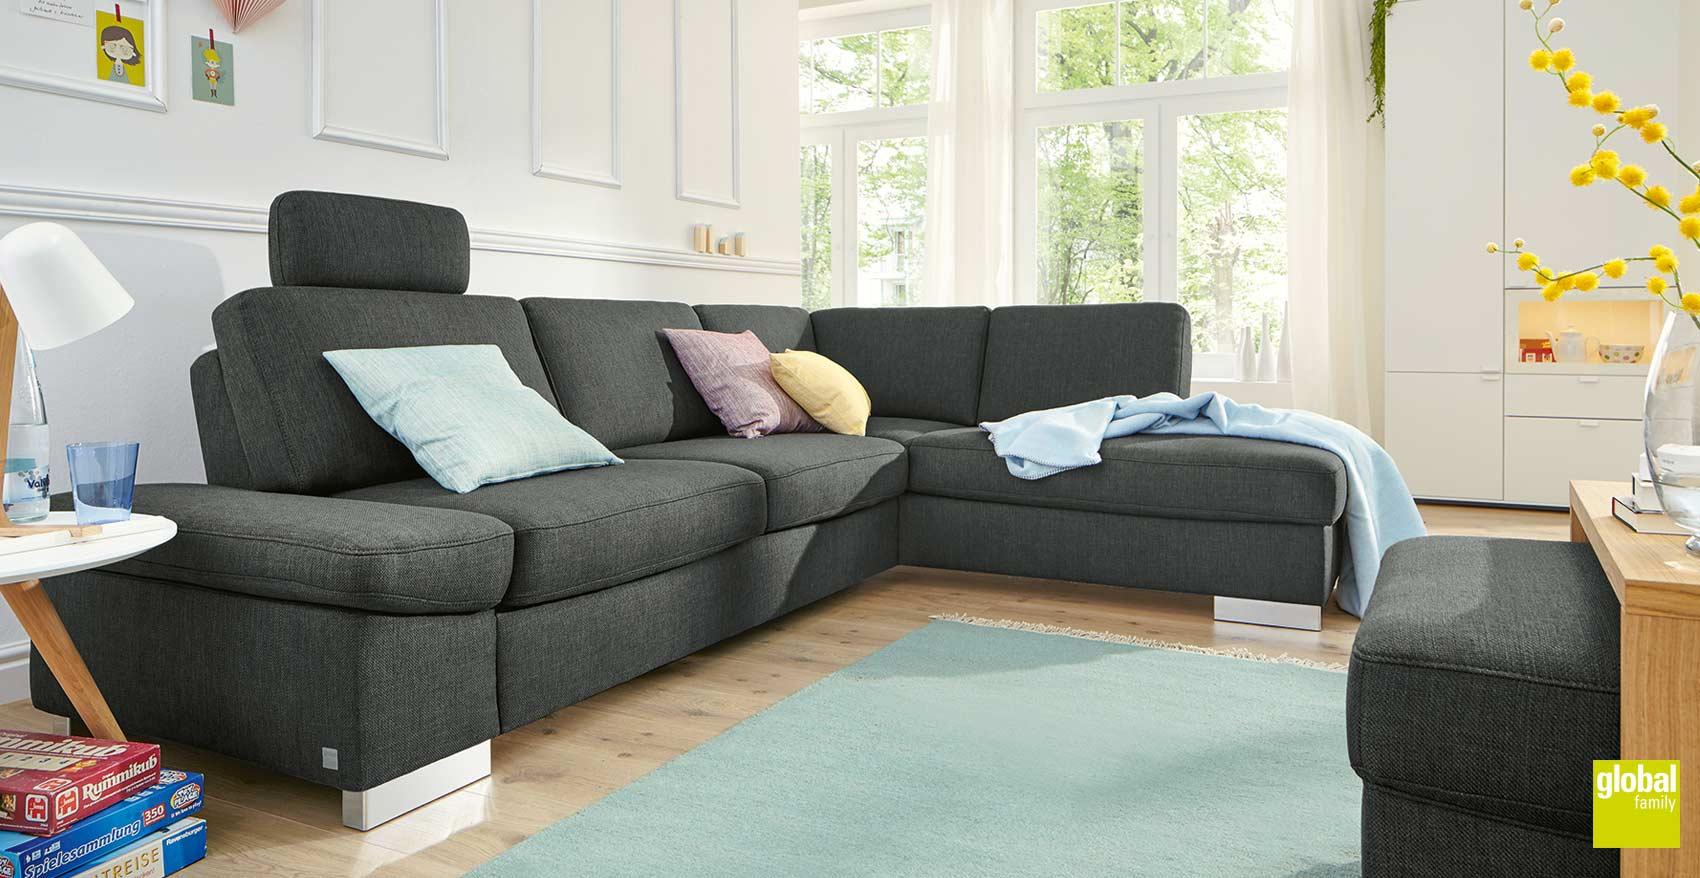 Möbel In Augsburg global 6100 global wohnen in rehling nahe augsburg möbel raschke